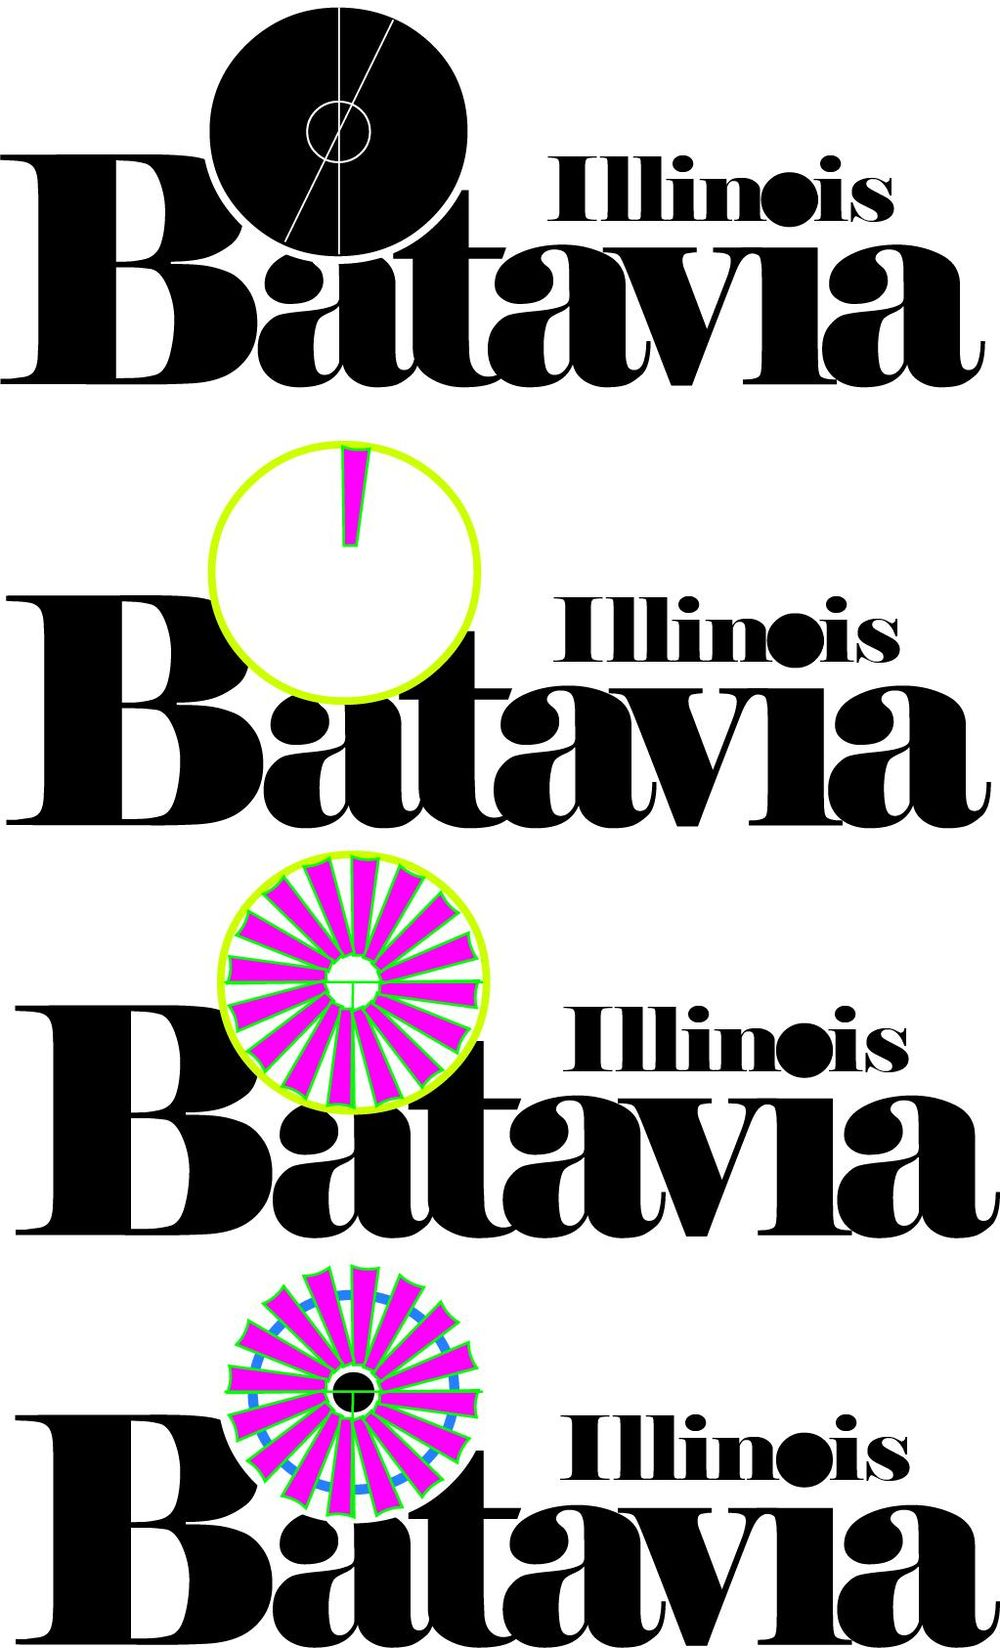 Batavia, Illinois! - image 6 - student project